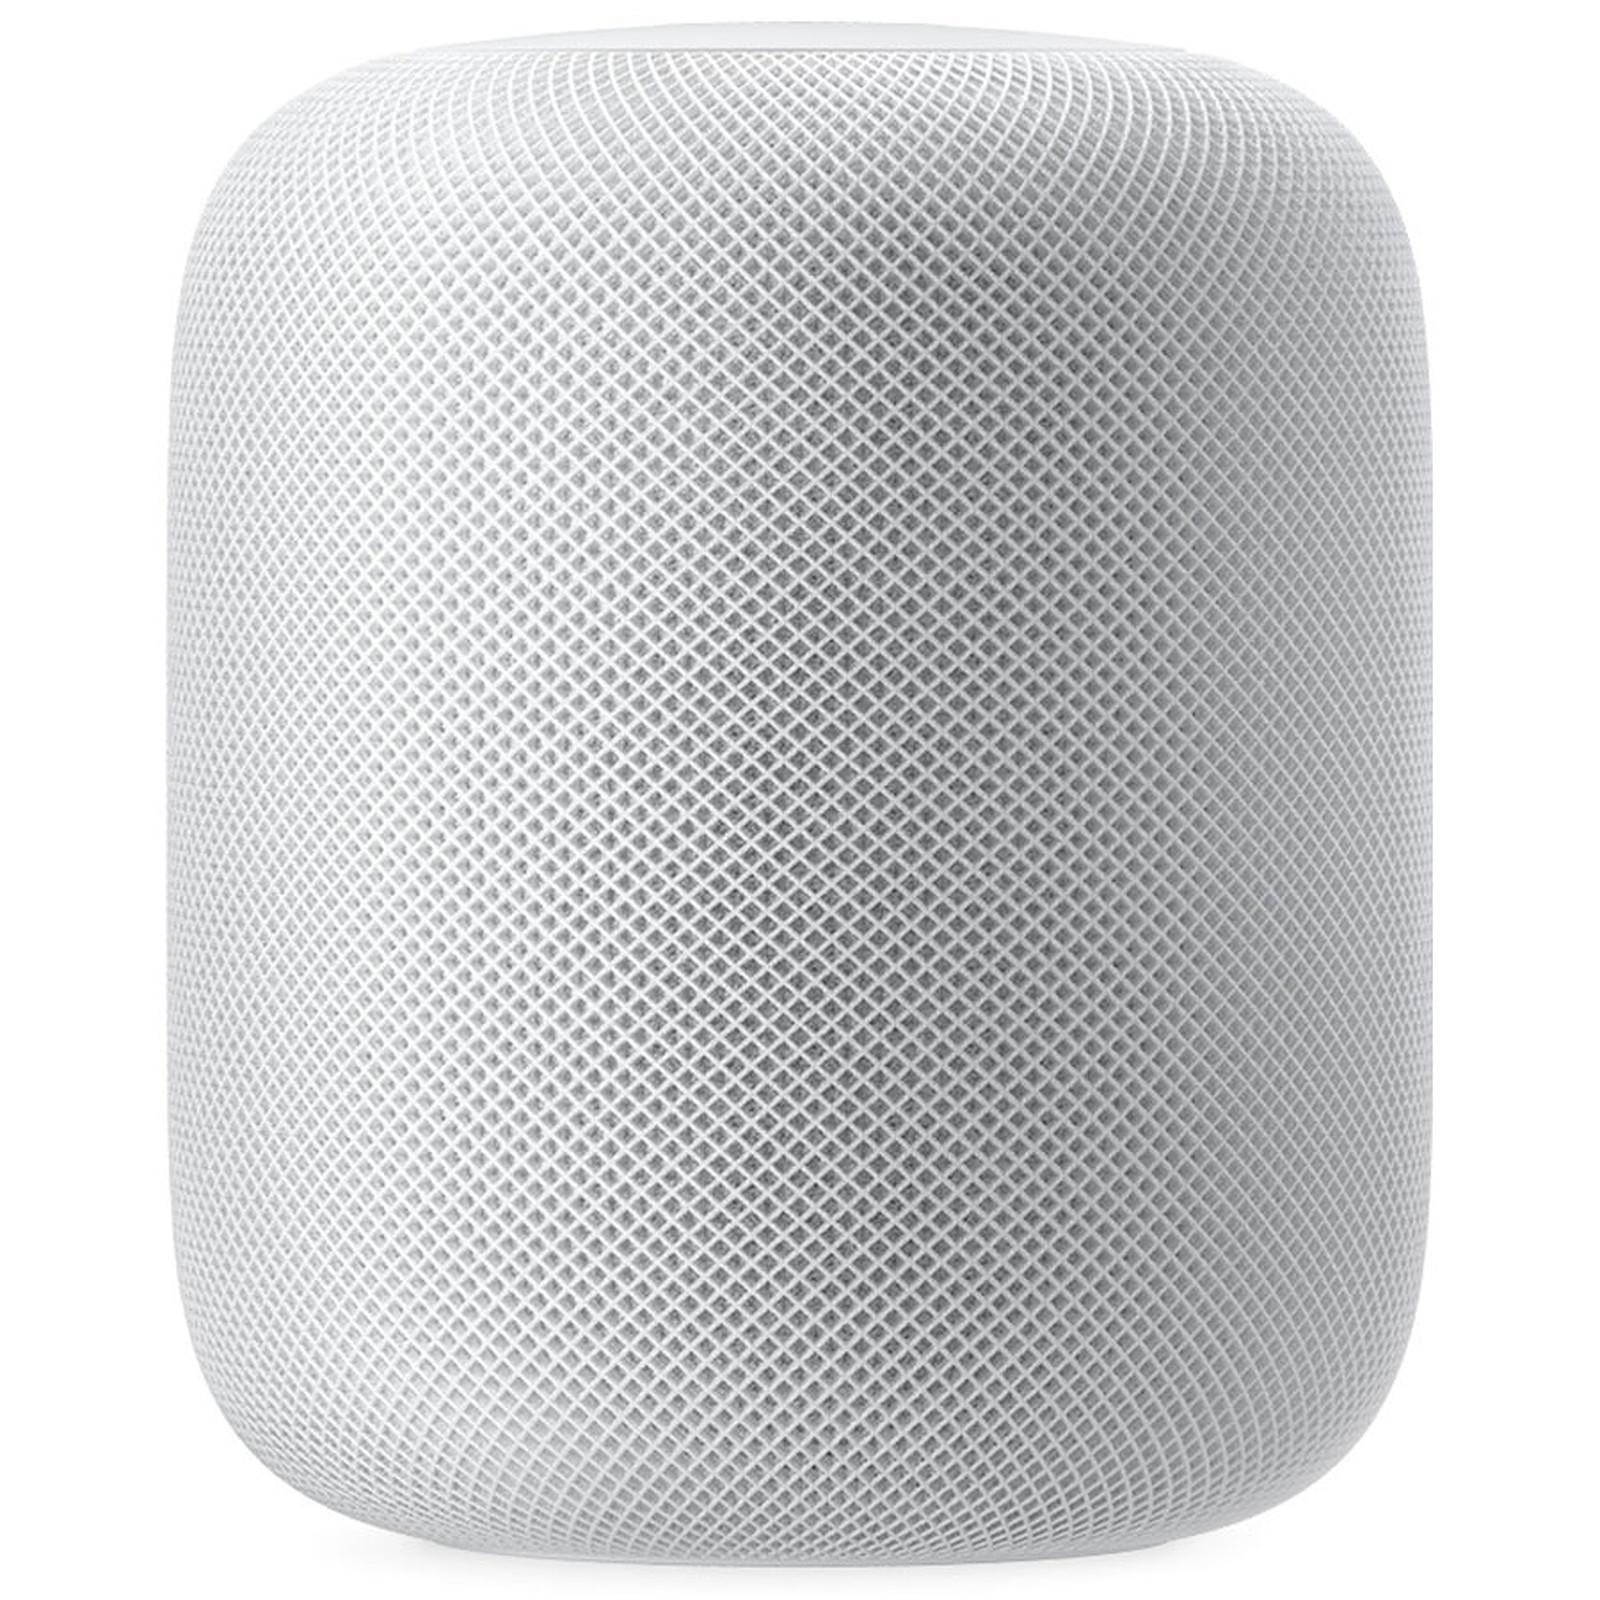 Apple HomePod Blanco